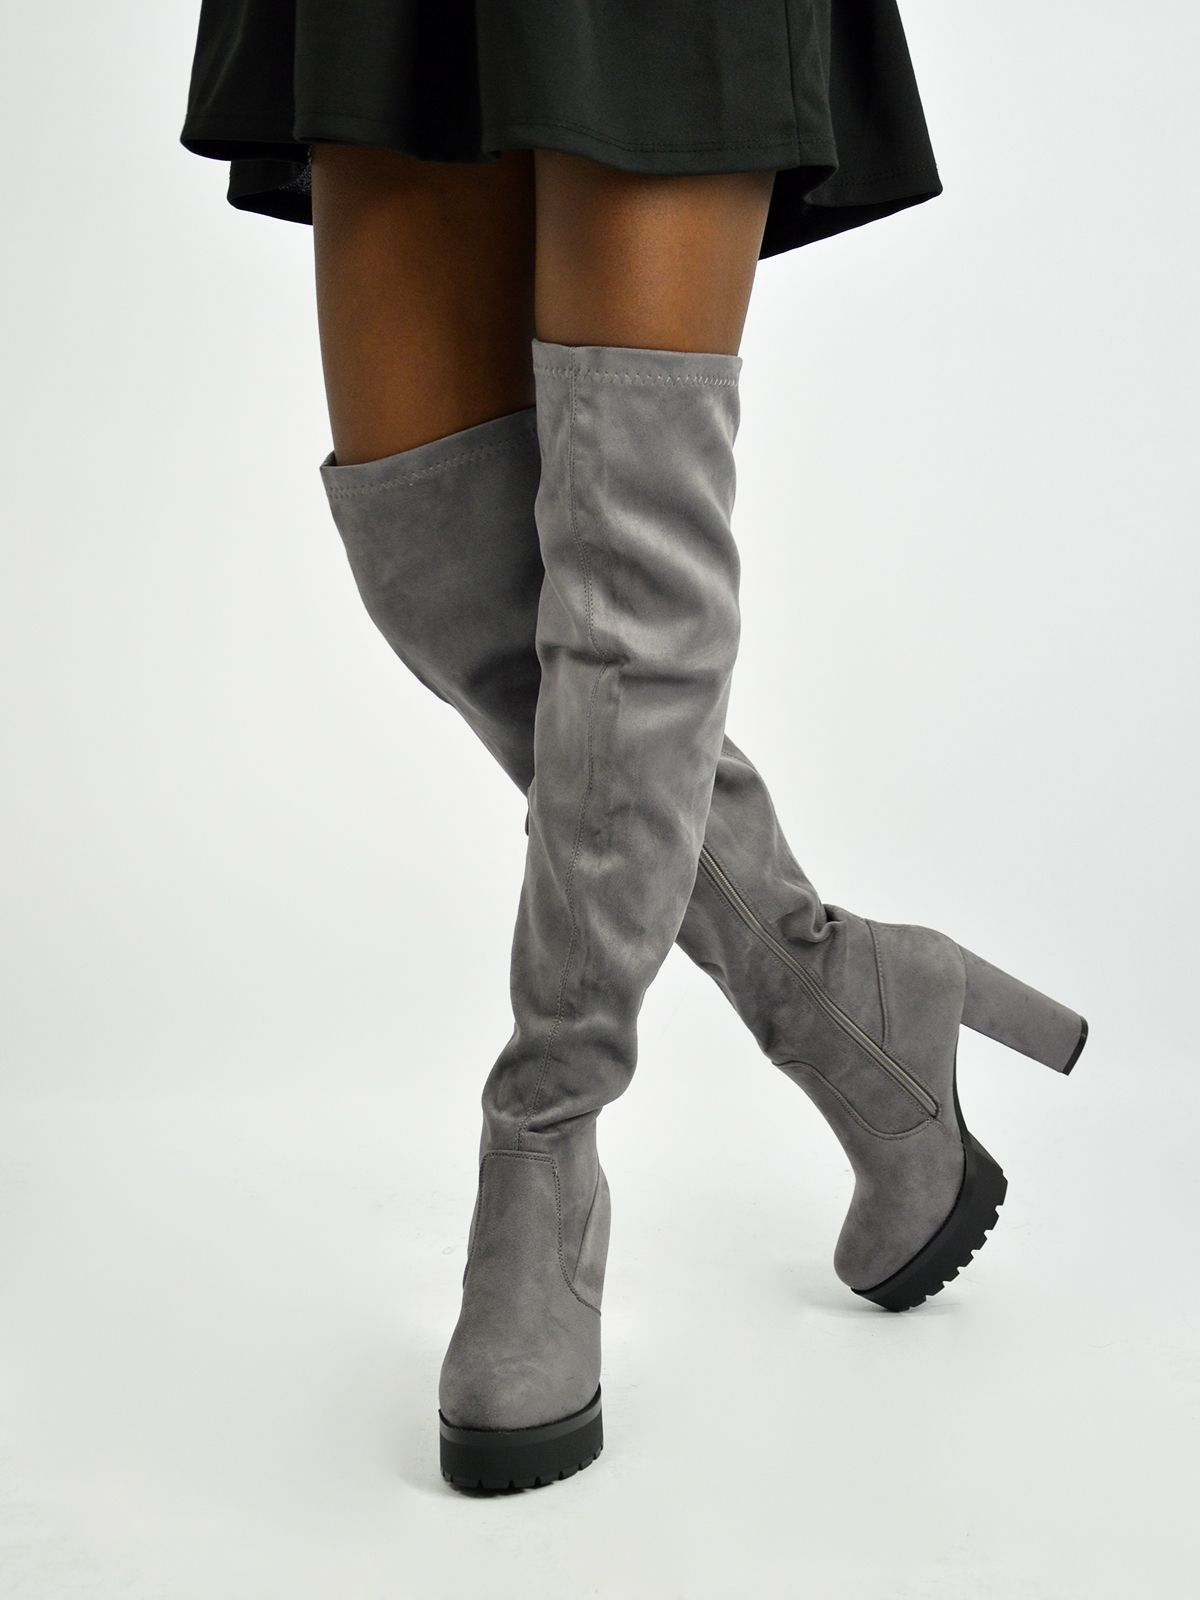 6b39a9a6122 X9104 Μπότες Suede Over the Knee - Decoro - Γυναικεία ρούχα, ανδρικά ...